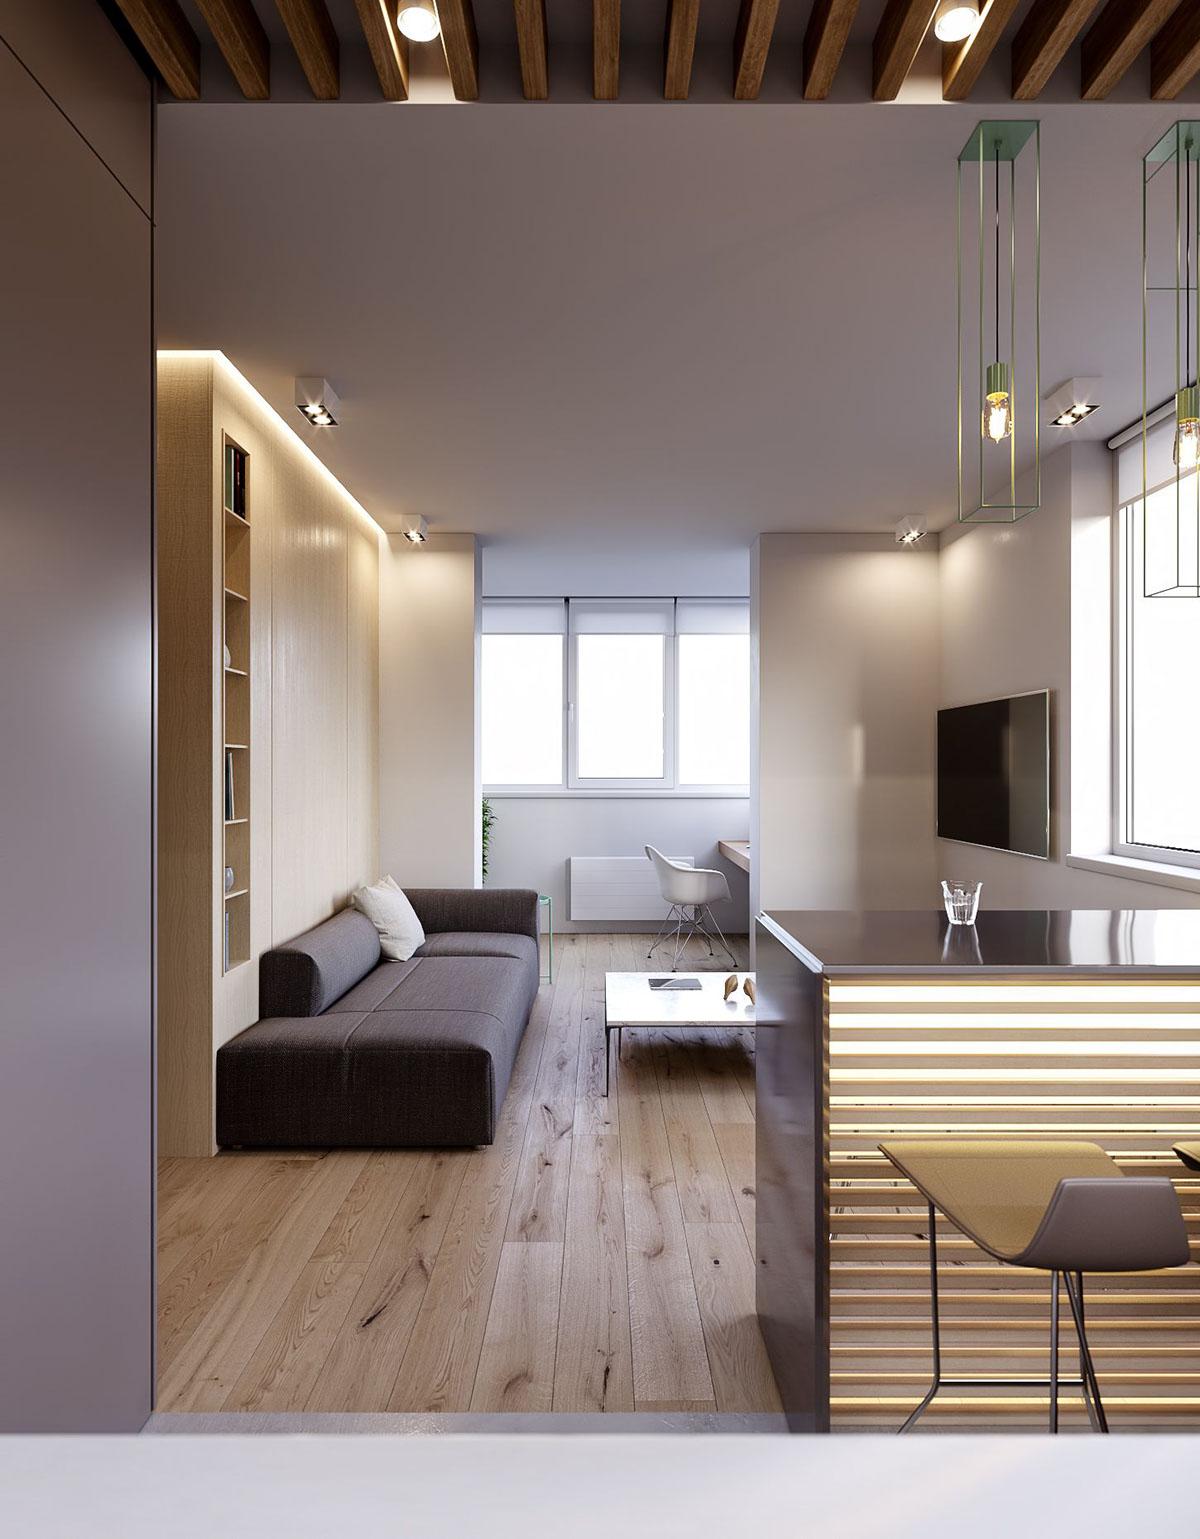 kitchen-island-embellishments-wooden-flooring